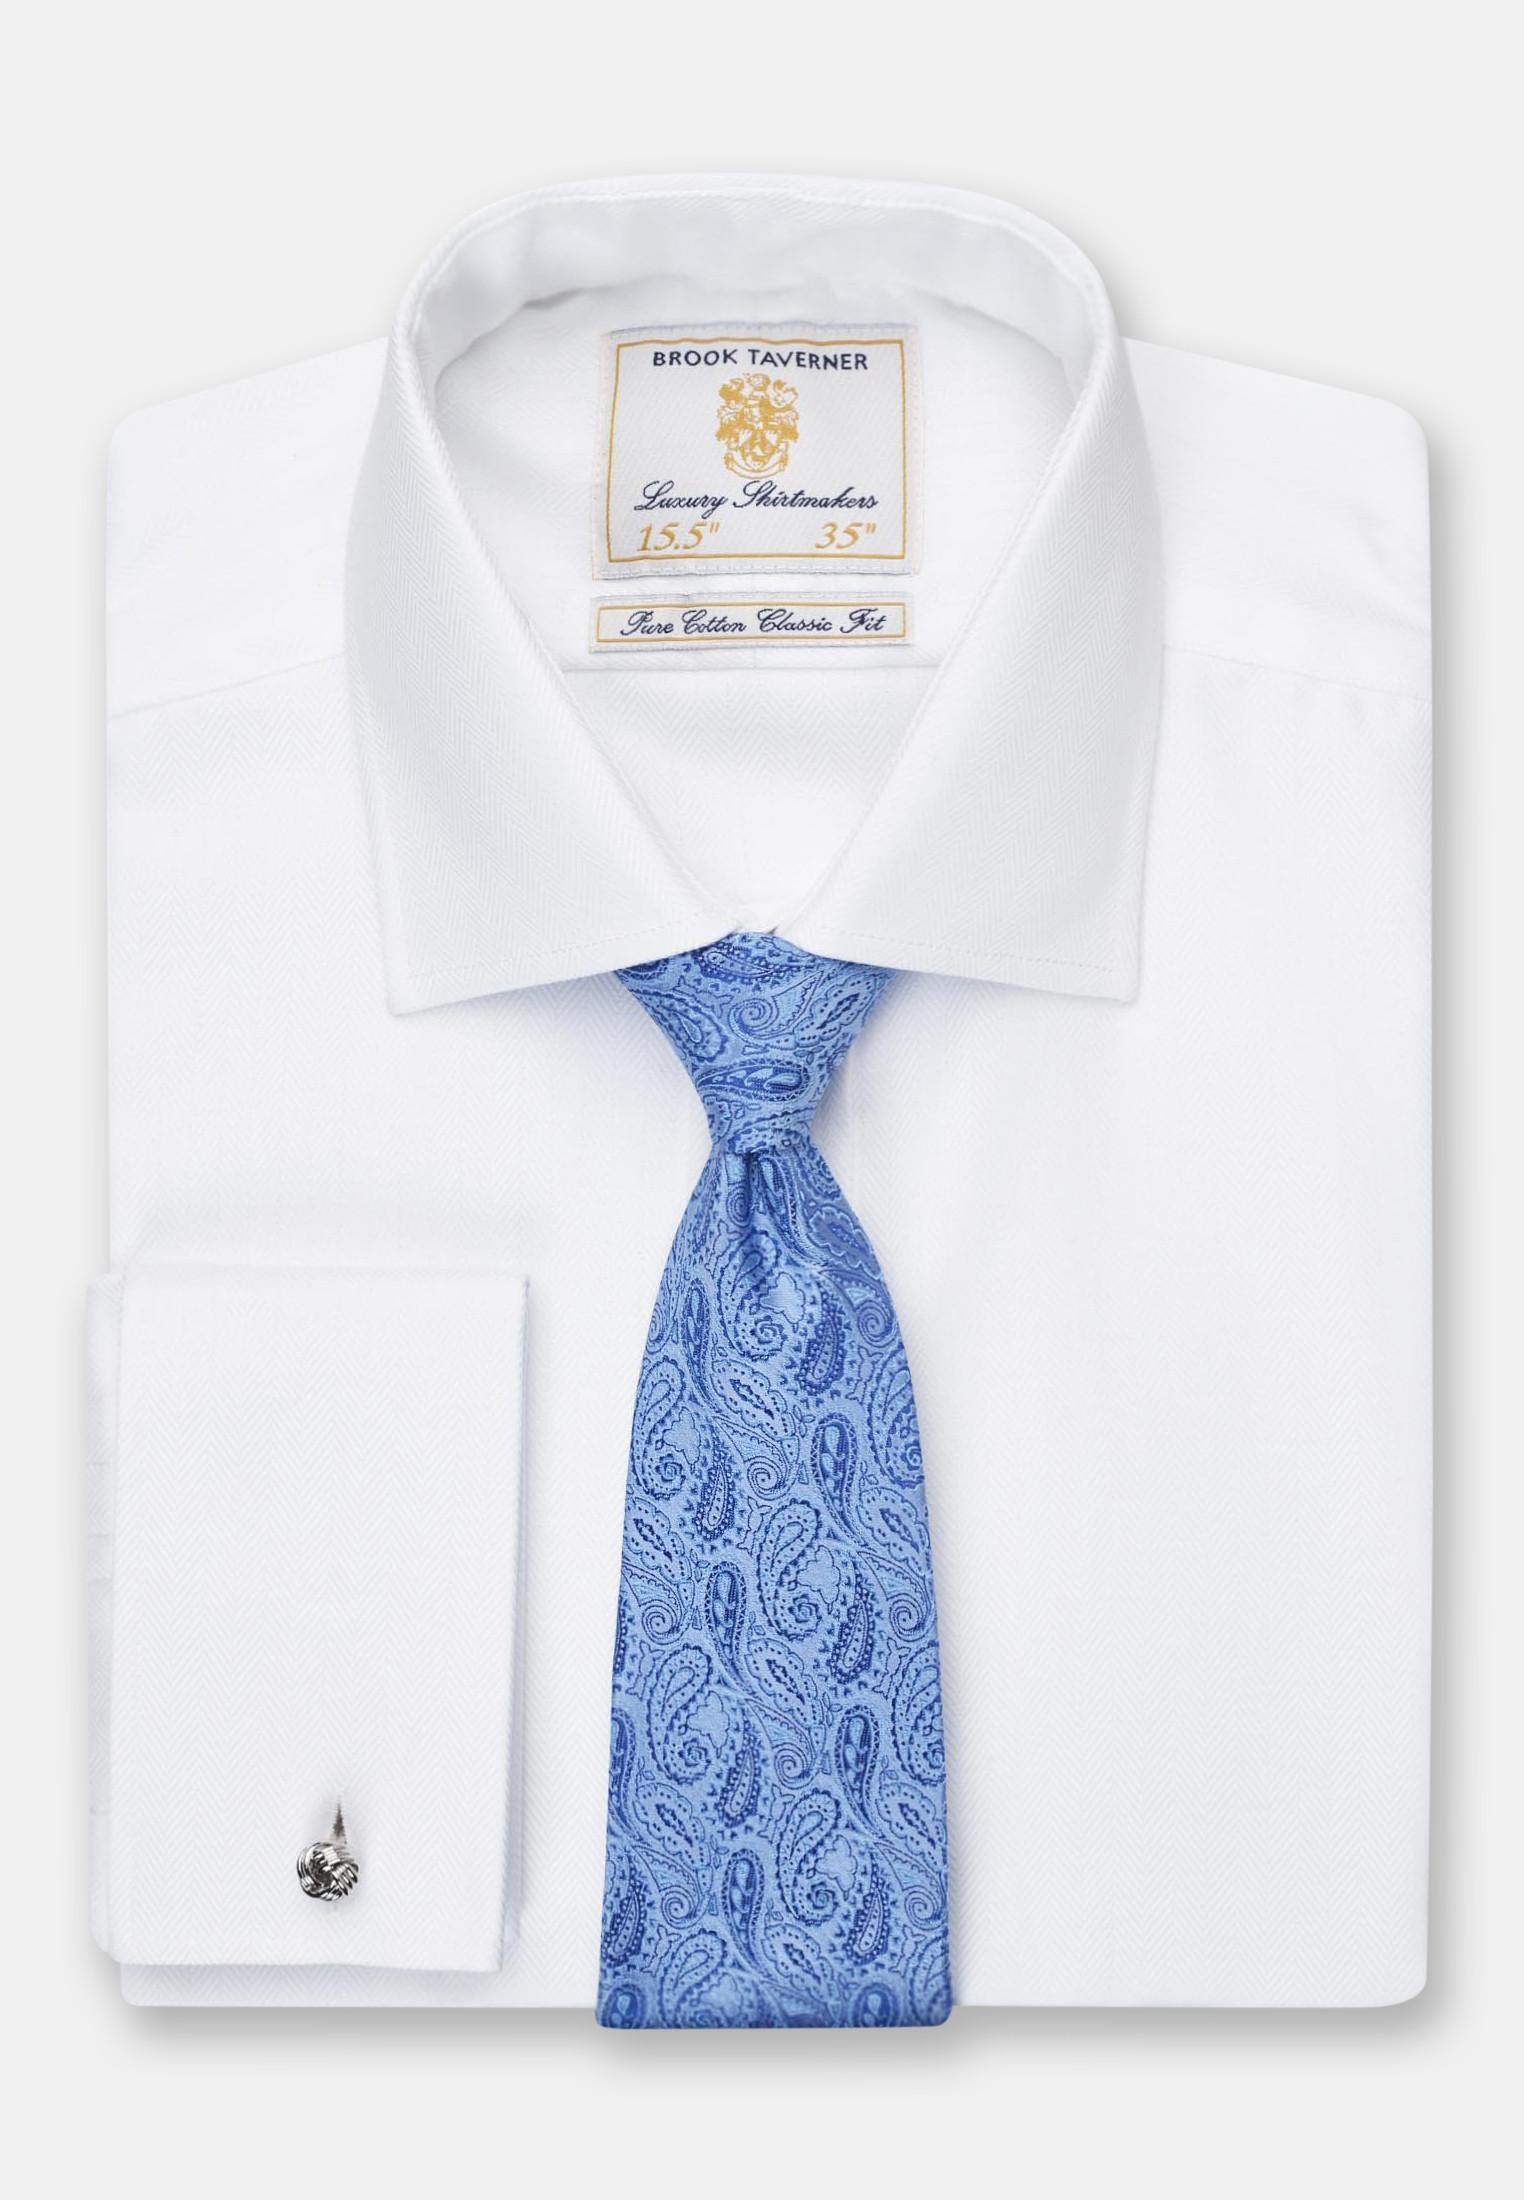 Single and Double Cuff White Herringbone 100% Easycare Cotton Shirt